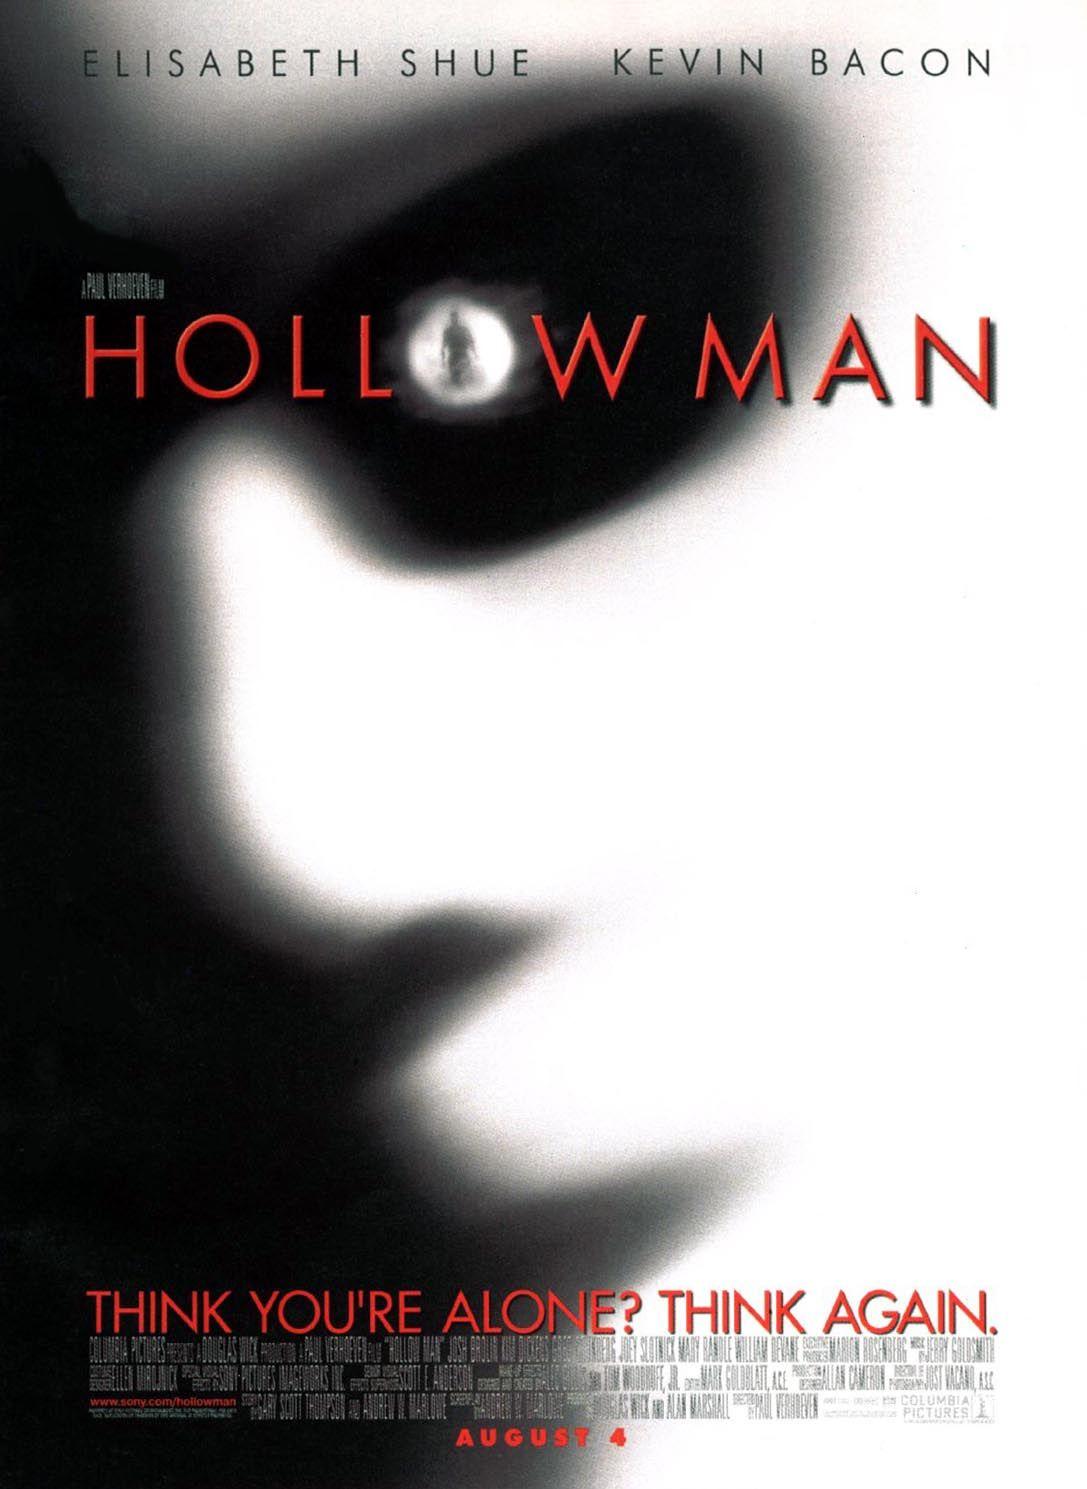 Hollow Man (2000) | Scratchpad | FANDOM powered by Wikia